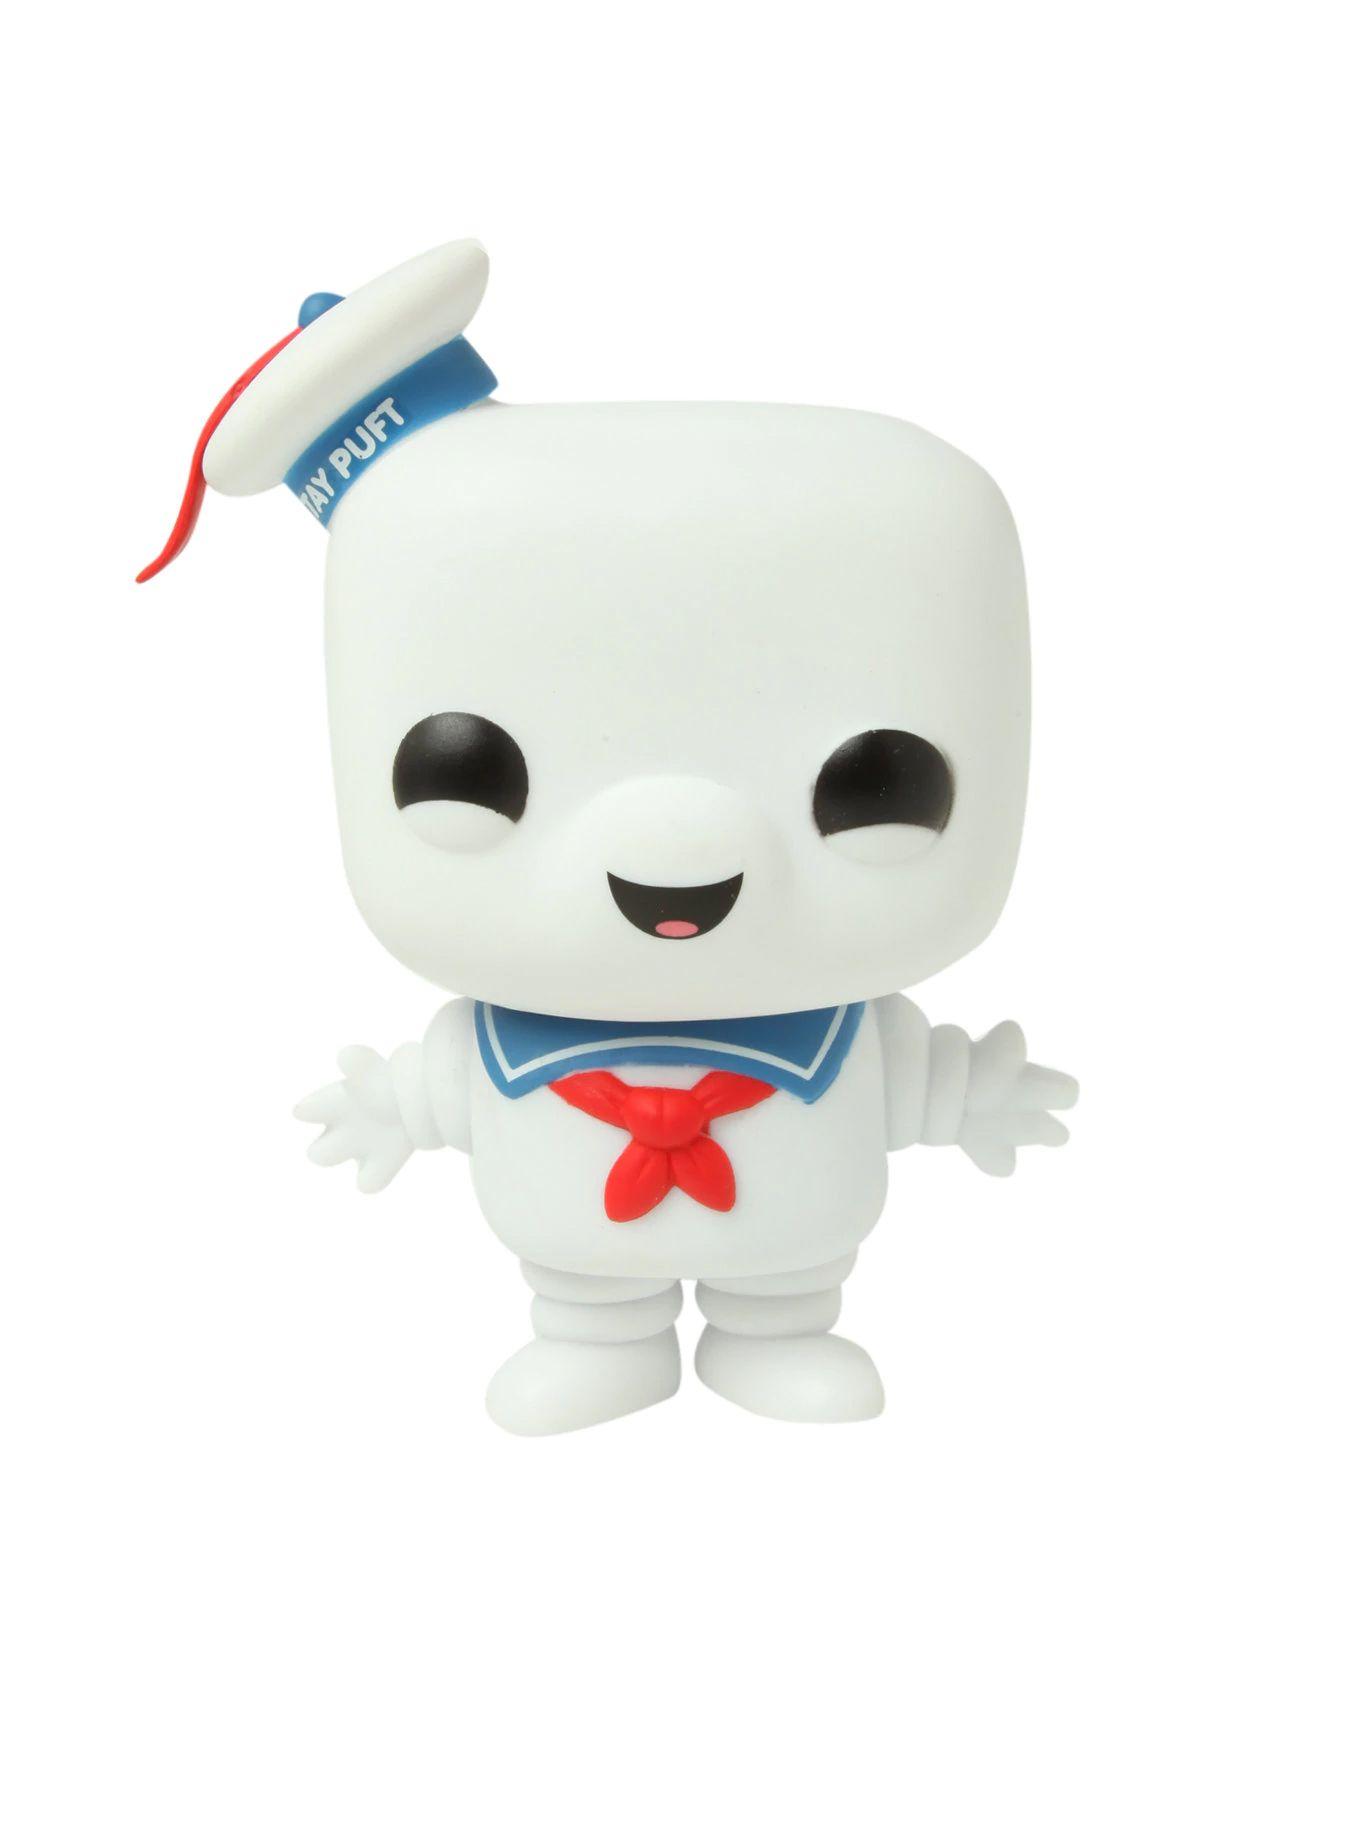 Stay Puft Marshmallow Man #109 - Ghostbusters ( Caça Fantasmas ) - Funko Pop! Movies